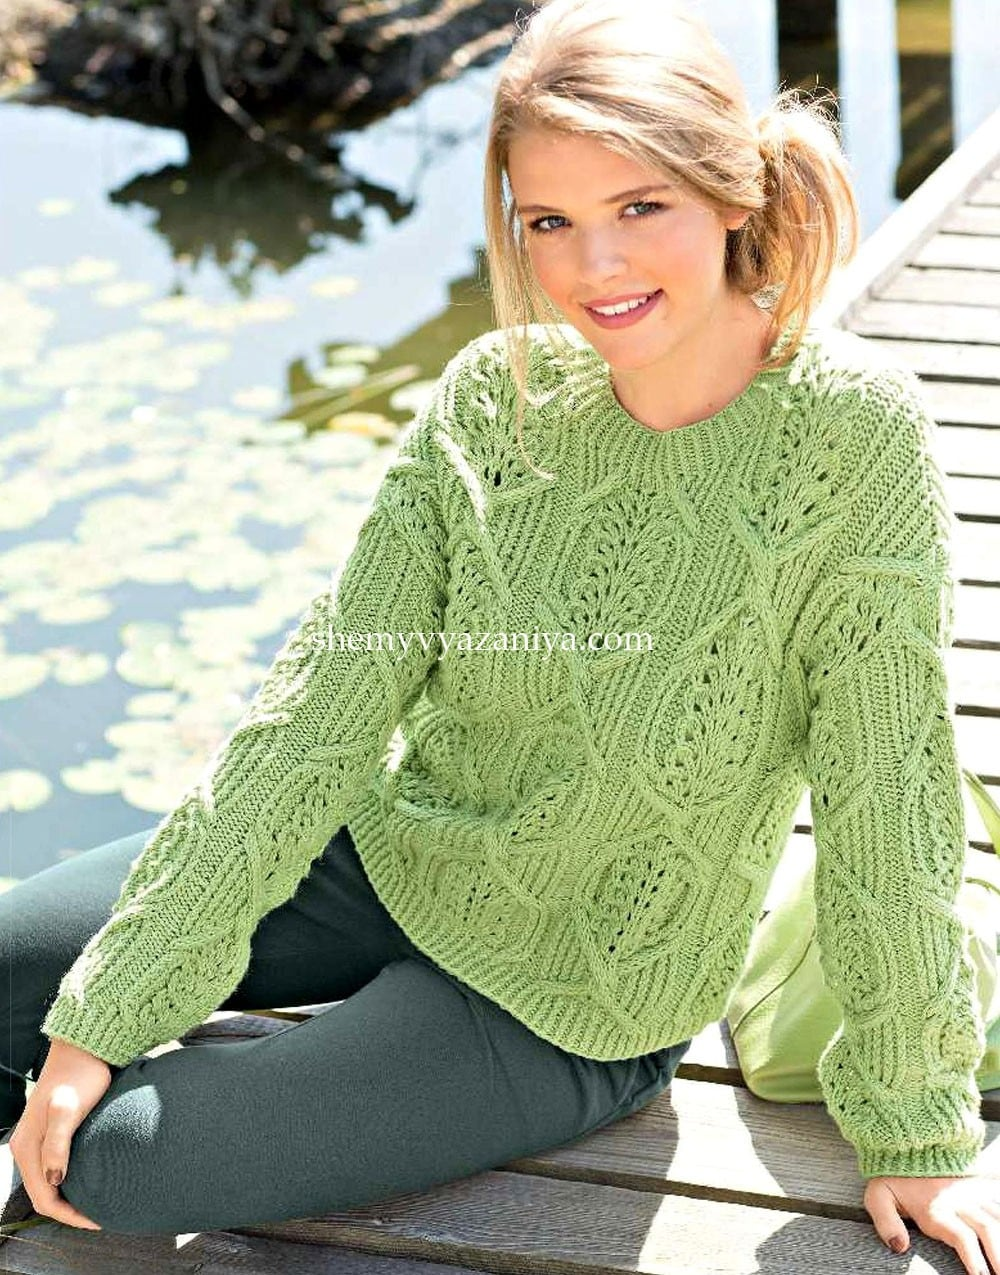 e0f82349cd49 Пуловер спицами - Схемы вязания